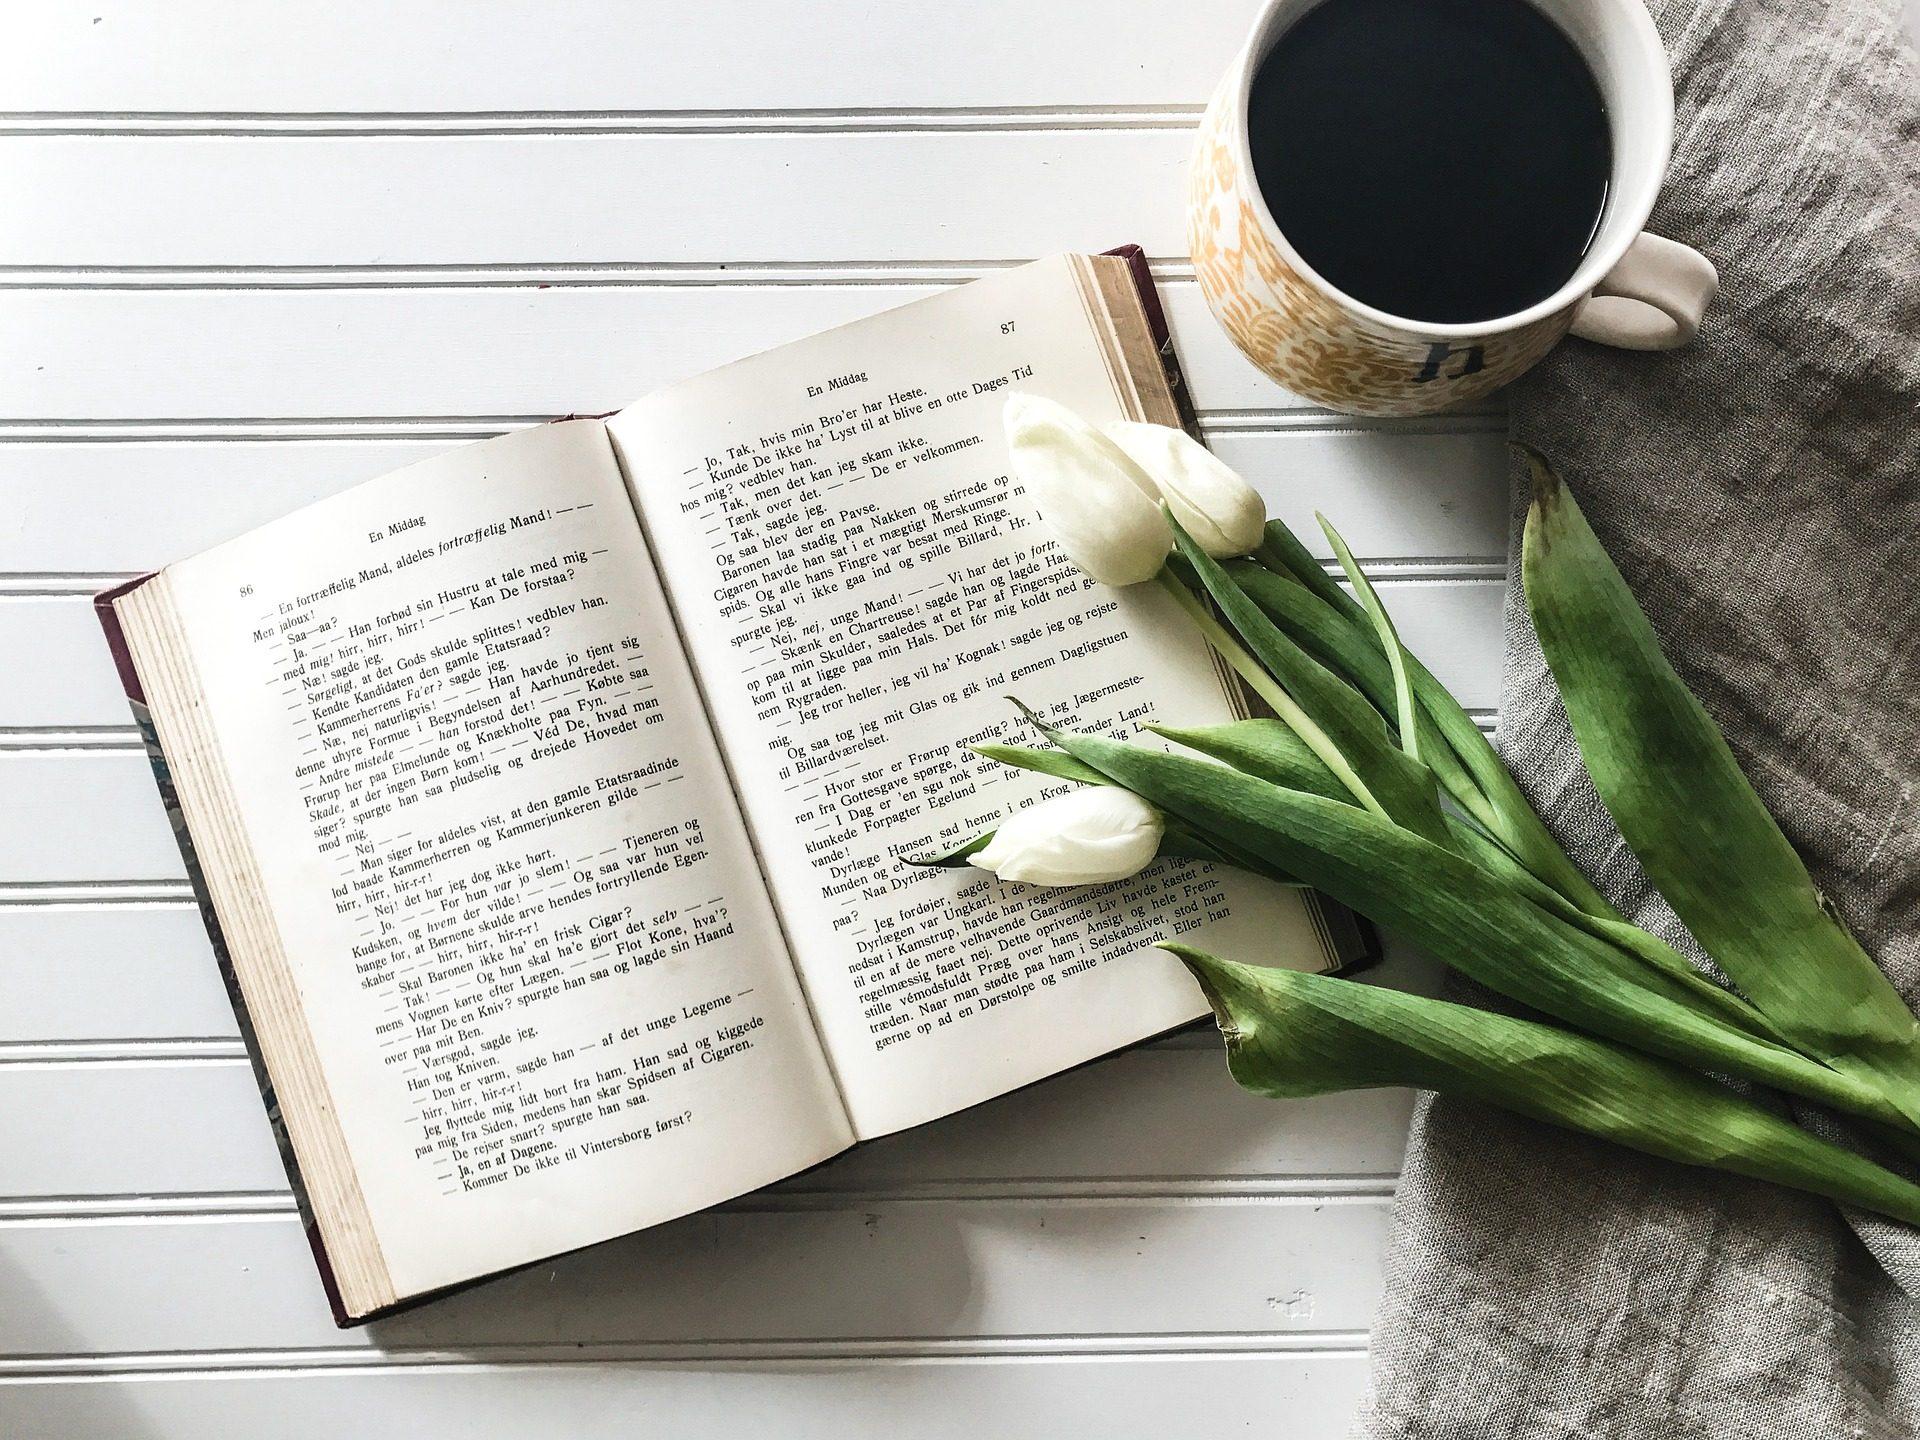 libro, taza, café, desayuno, flores - Fondos de Pantalla HD - professor-falken.com